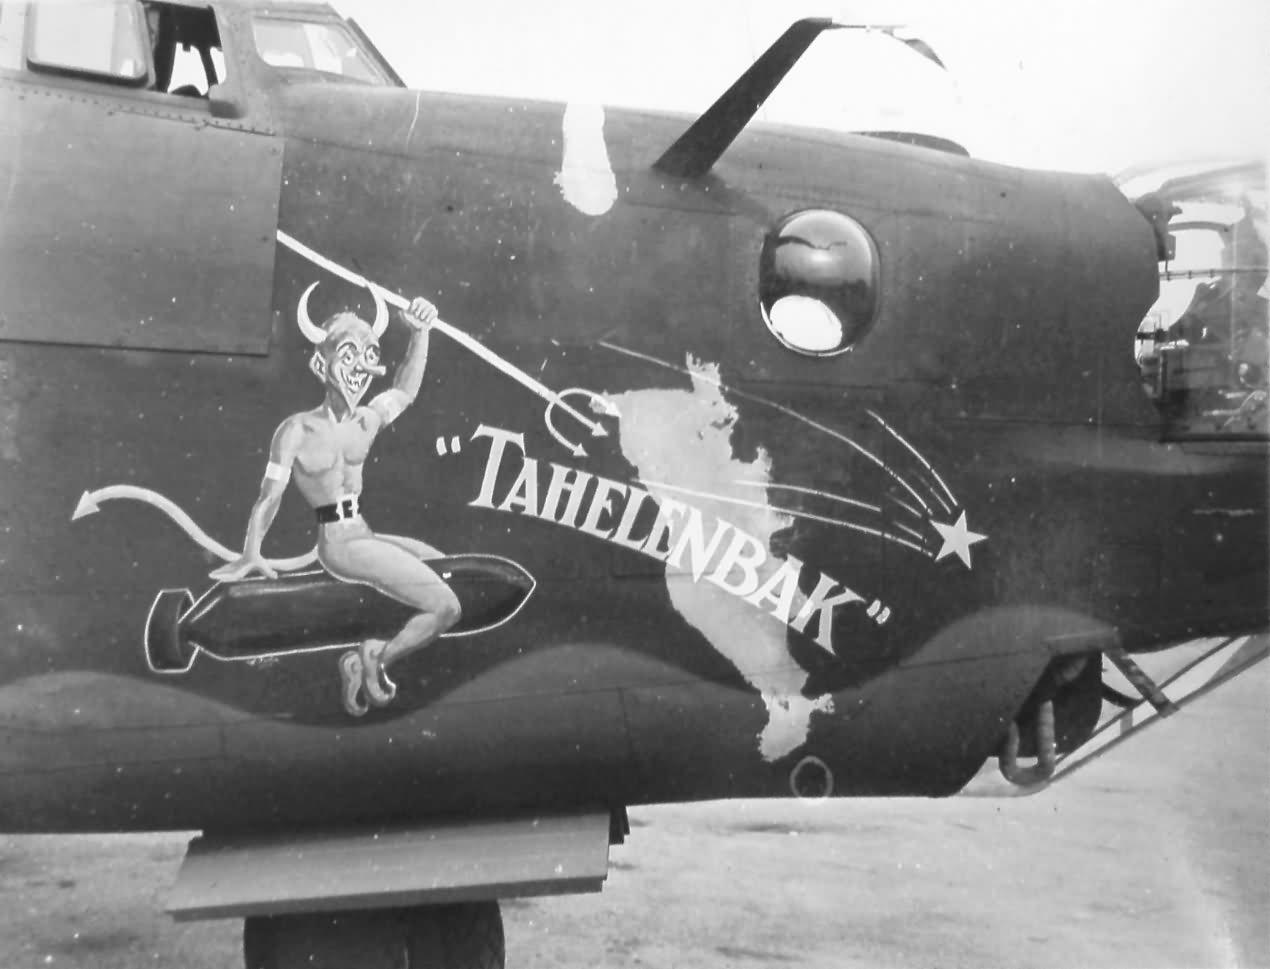 B-24 Liberator bomber  B 24 Liberator Nose Art